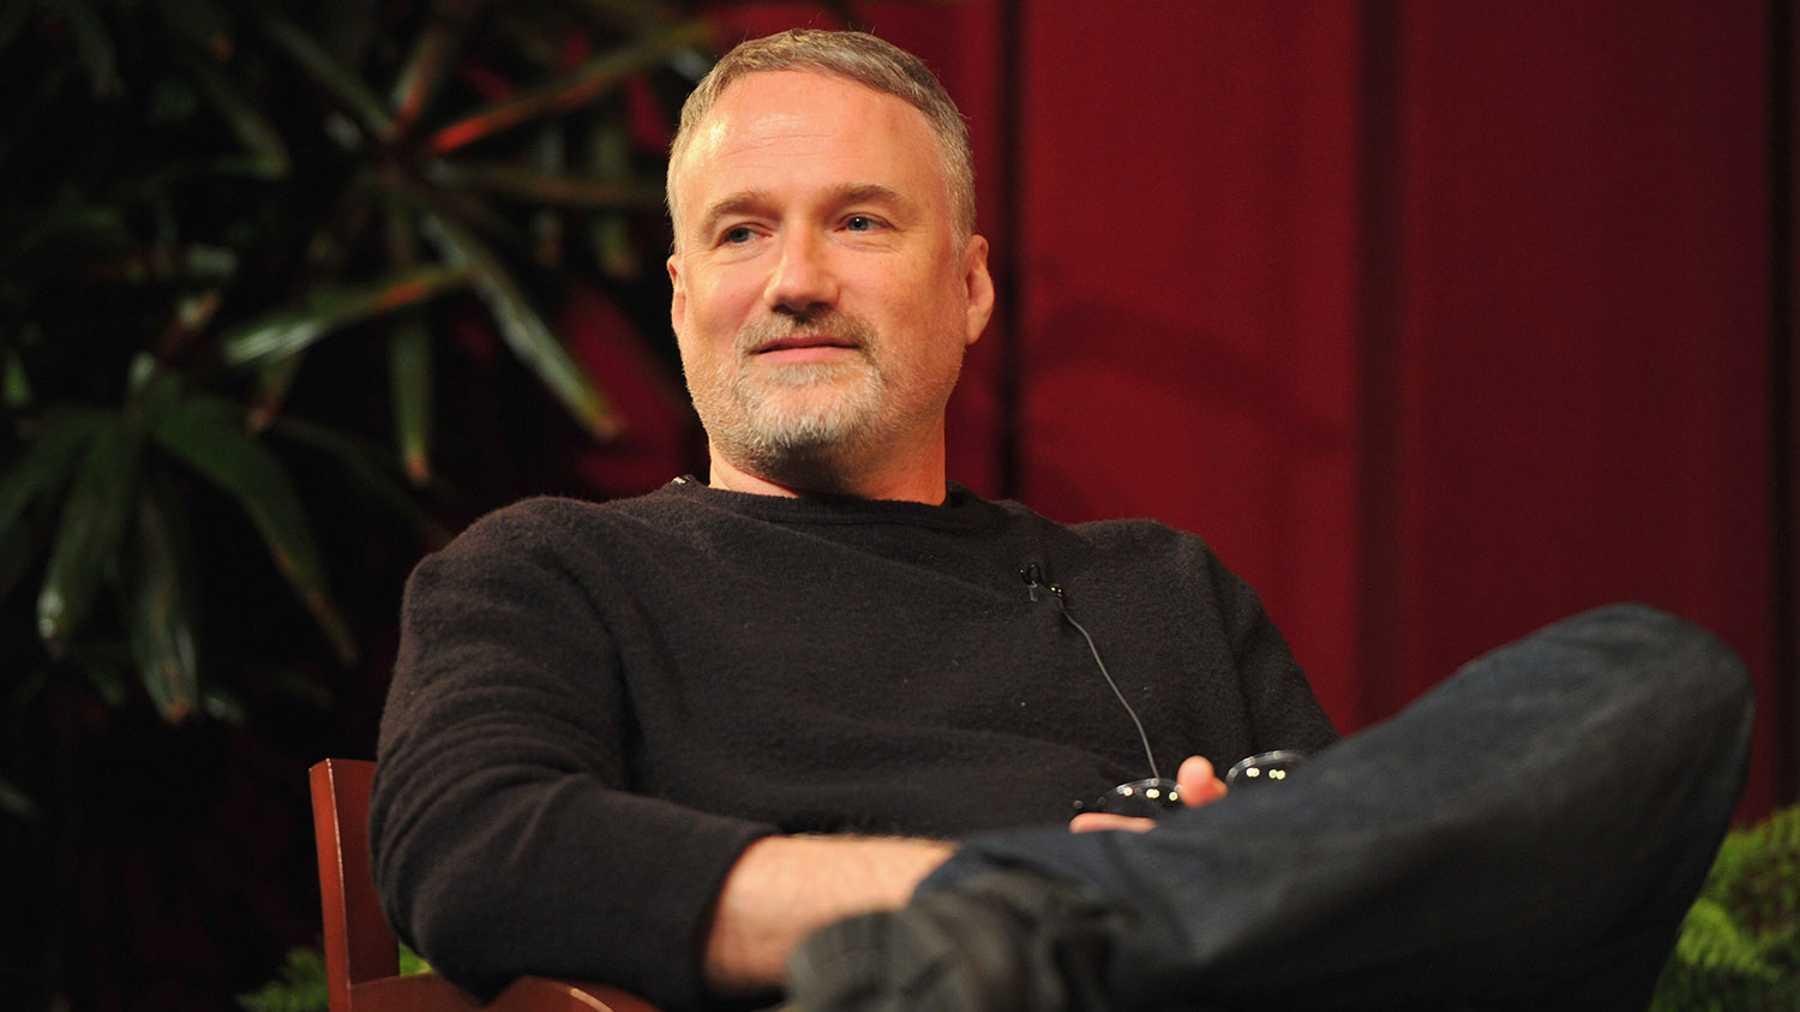 David Fincher 3 - دیوید فینچر | سینما، بیوگرافی و فیلم هایش